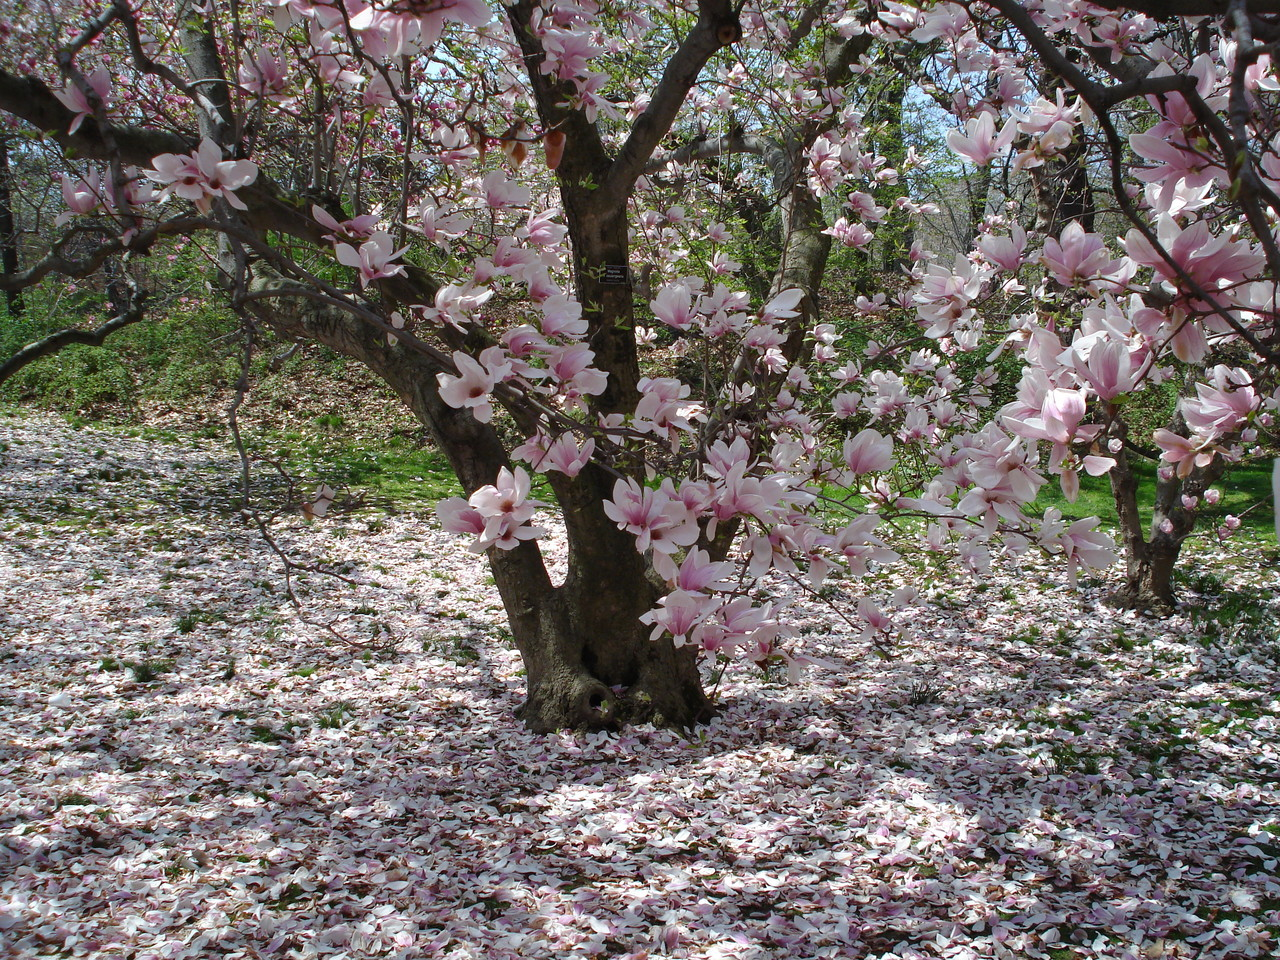 hight resolution of magnolias at the brooklyn botanic garden